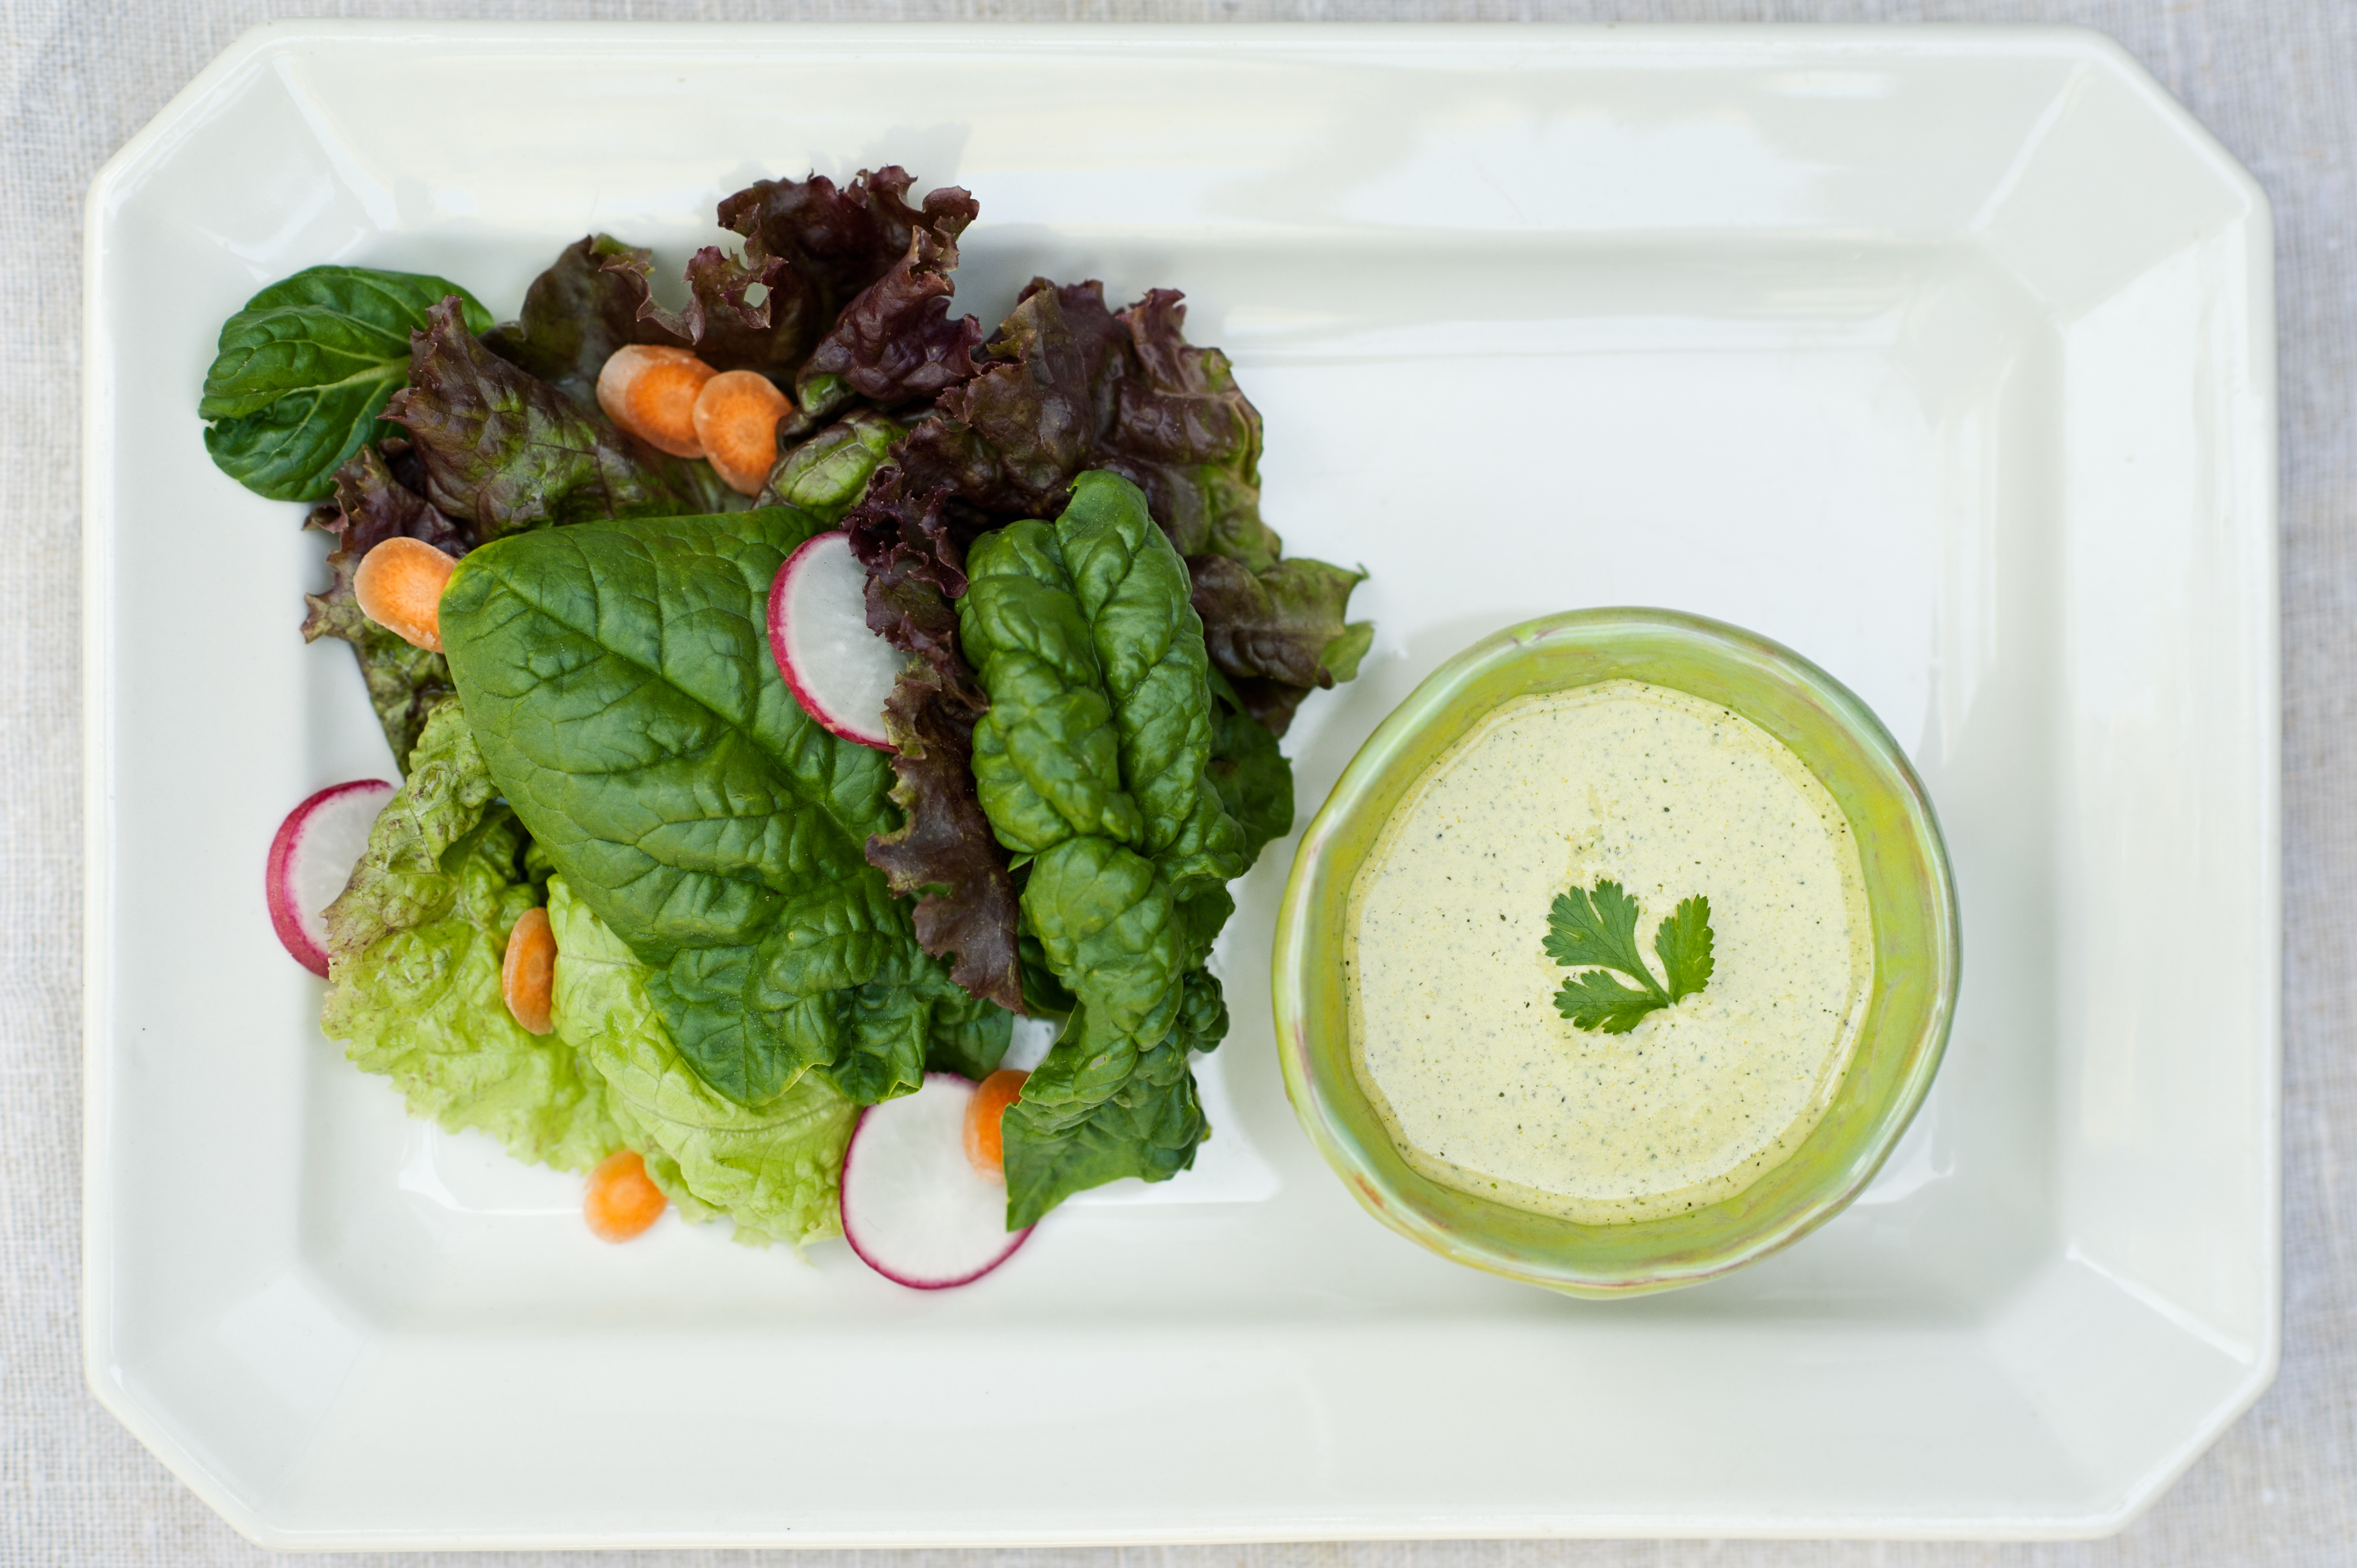 Organic, dairy-free Cilantro Mint Dressing